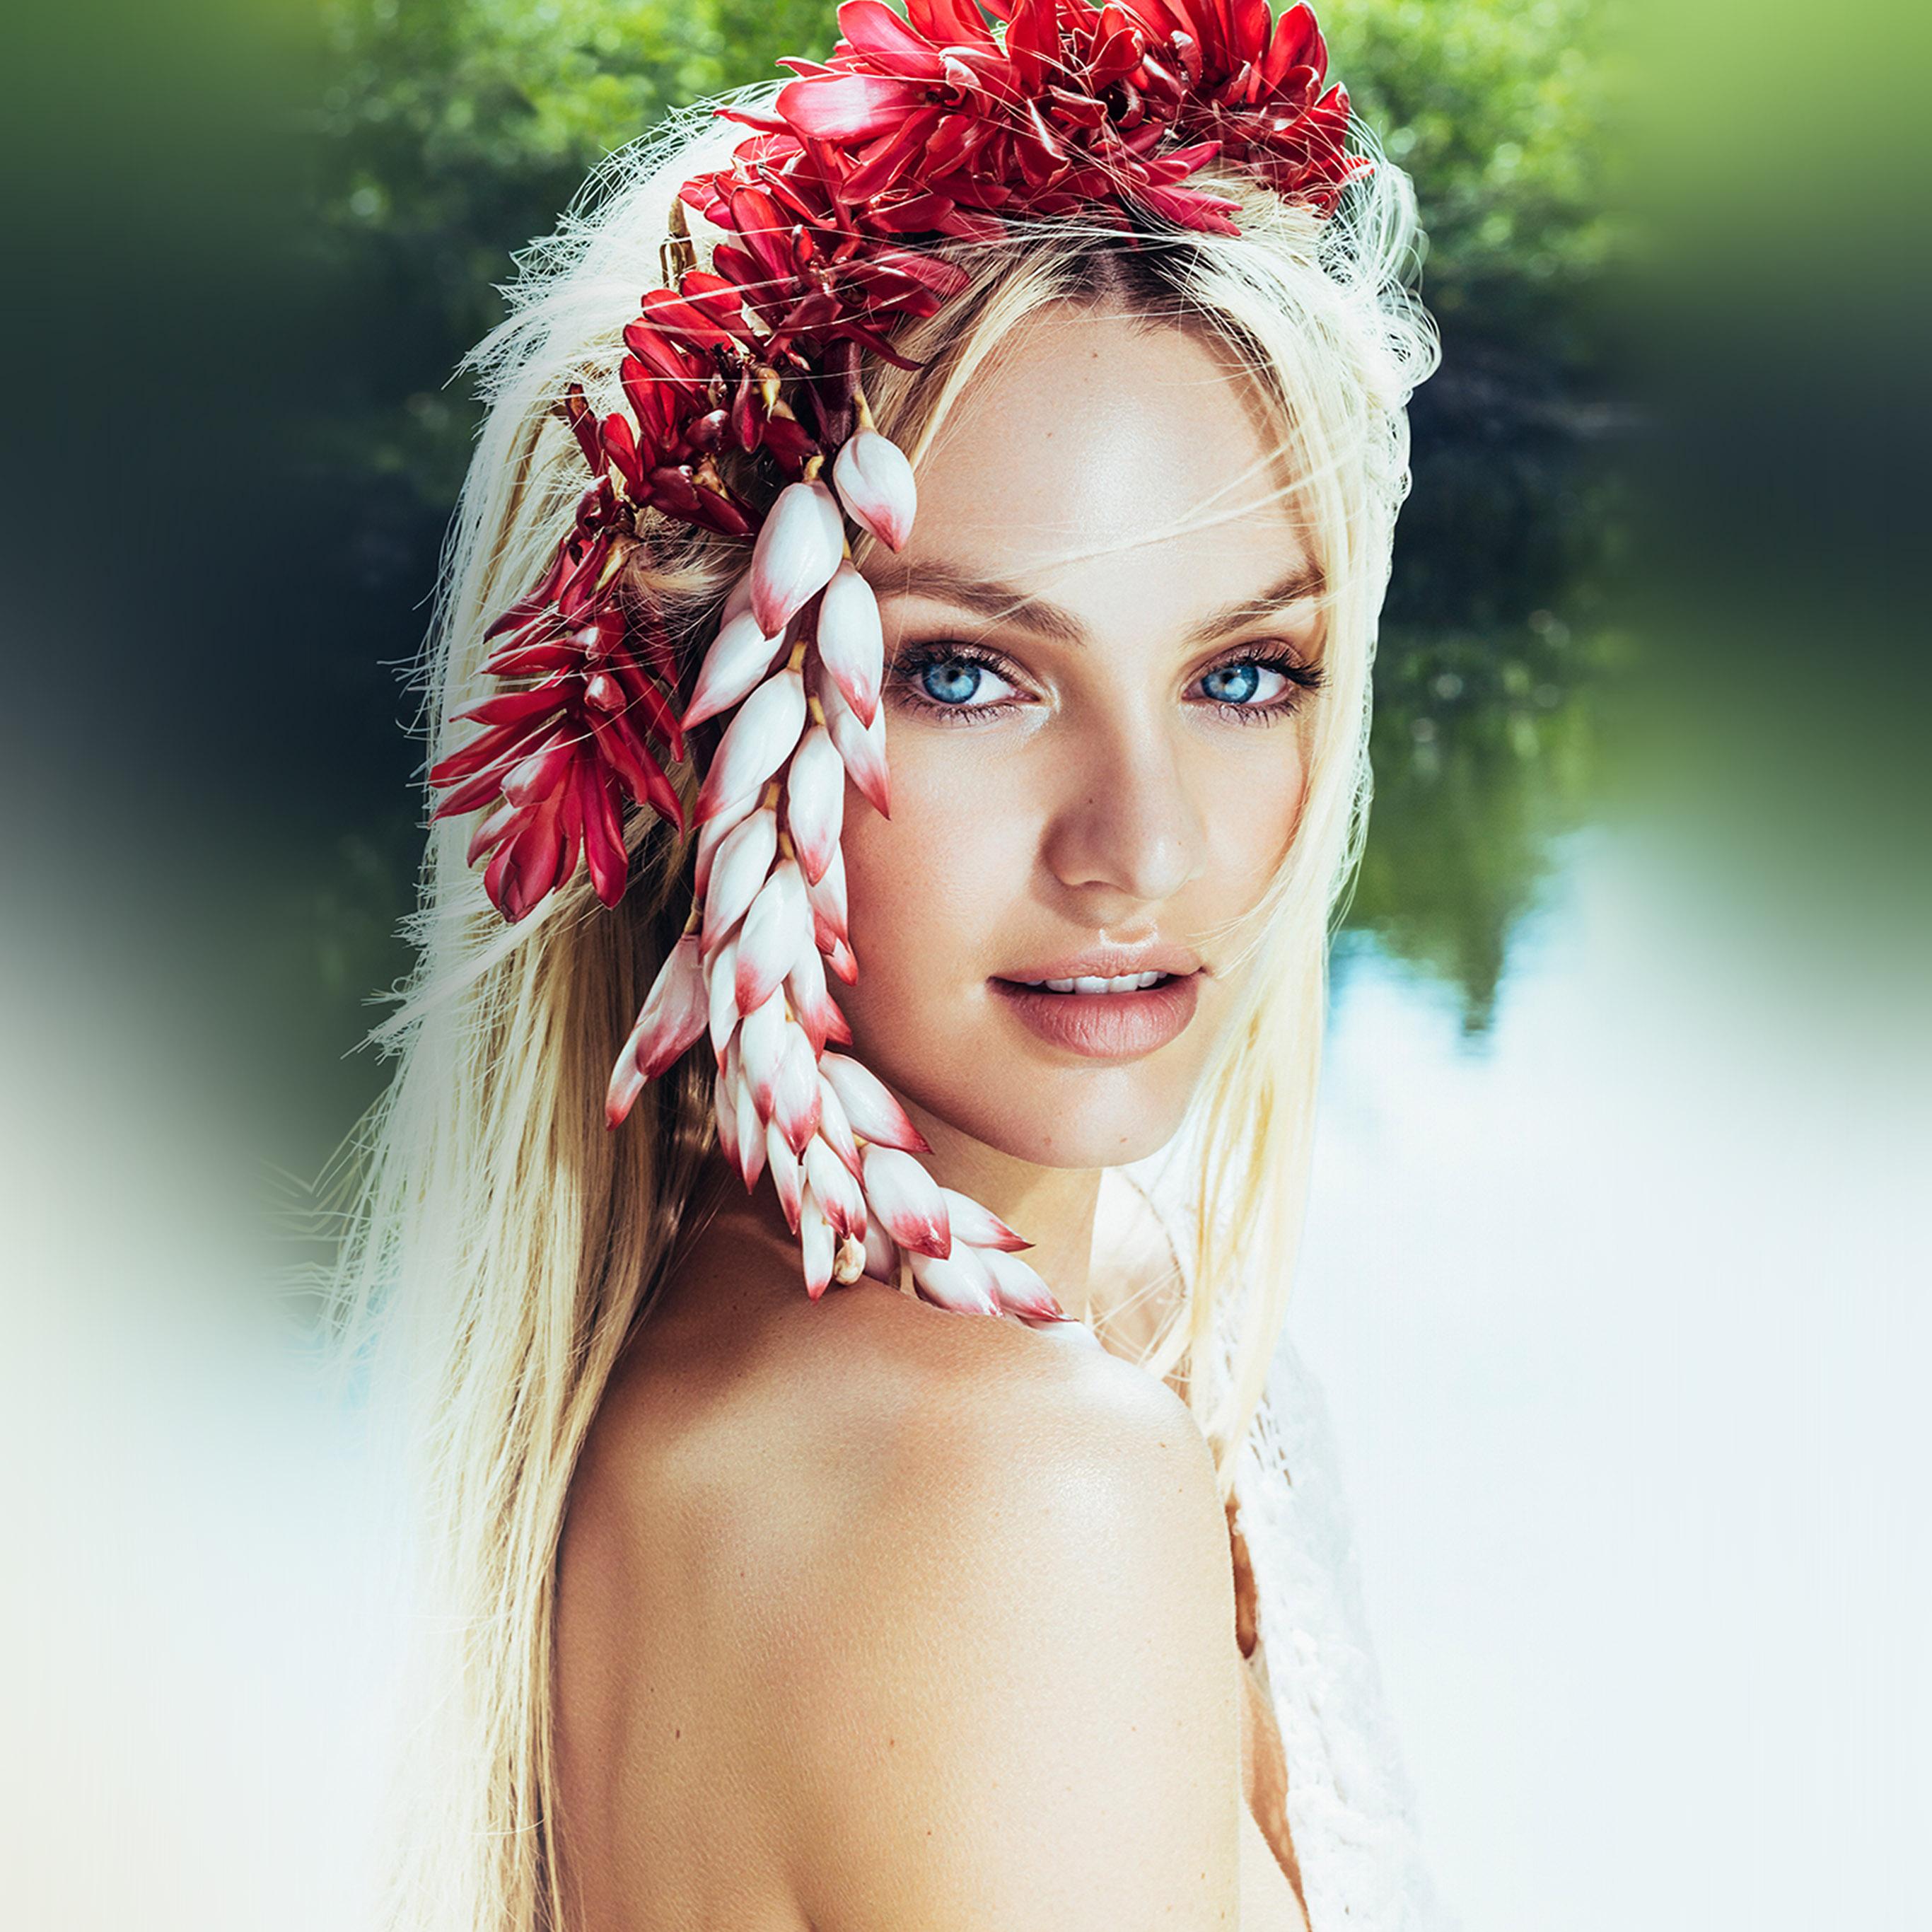 Imac Girl Wallpaper Hq10 Candice Swanepoel Model Girl Victoria Wallpaper